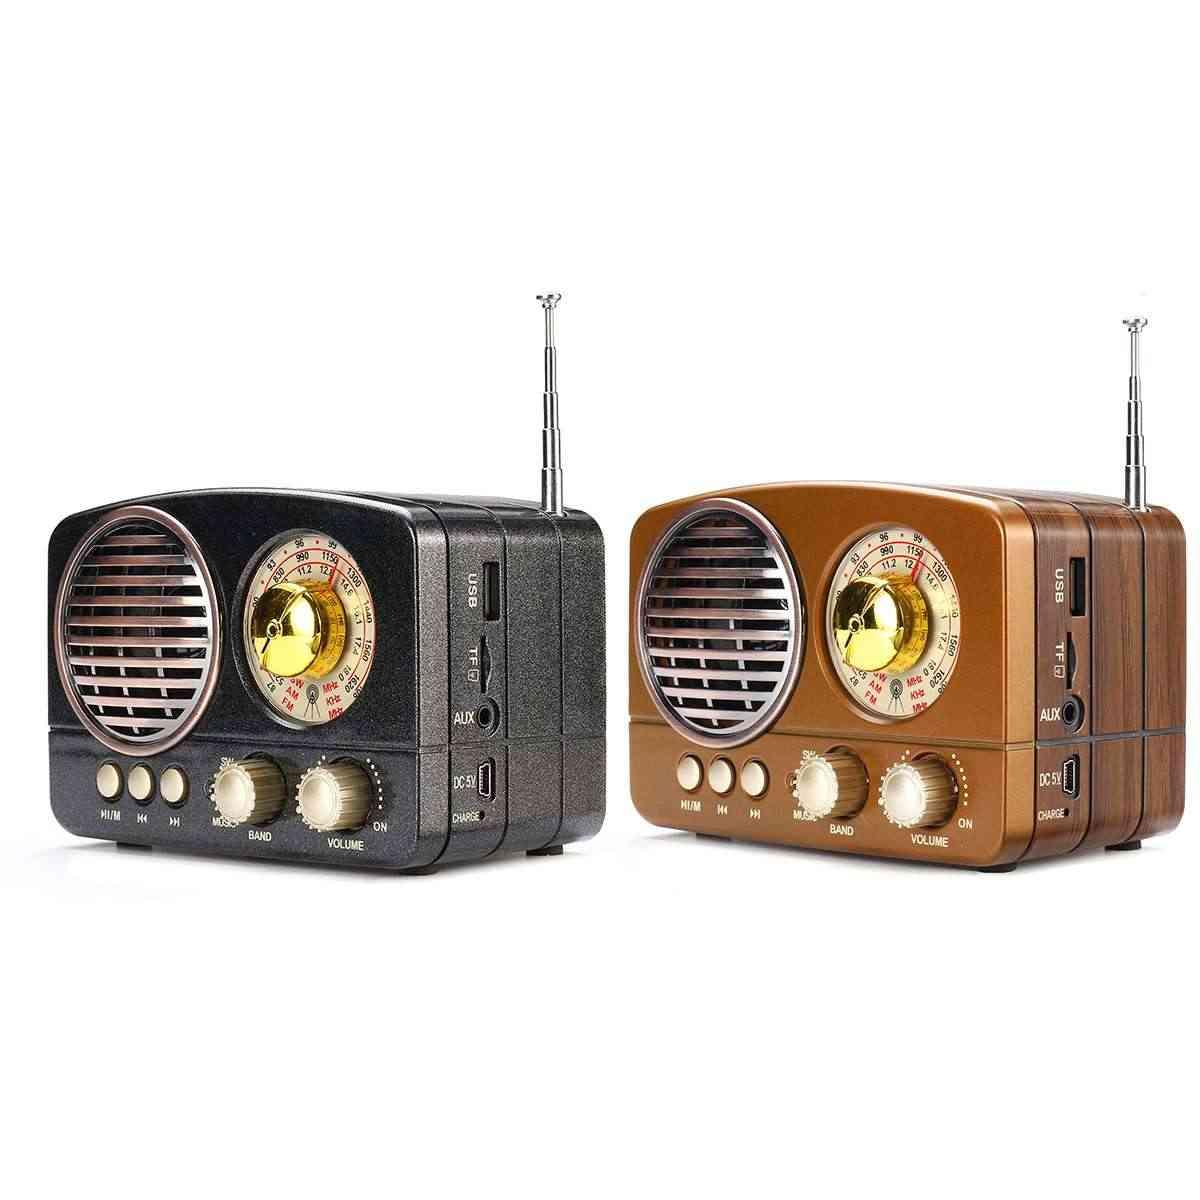 Portable Retro Radio Handheld Receiver Am Fm Sw+bluetooth Speaker Phone Music Player